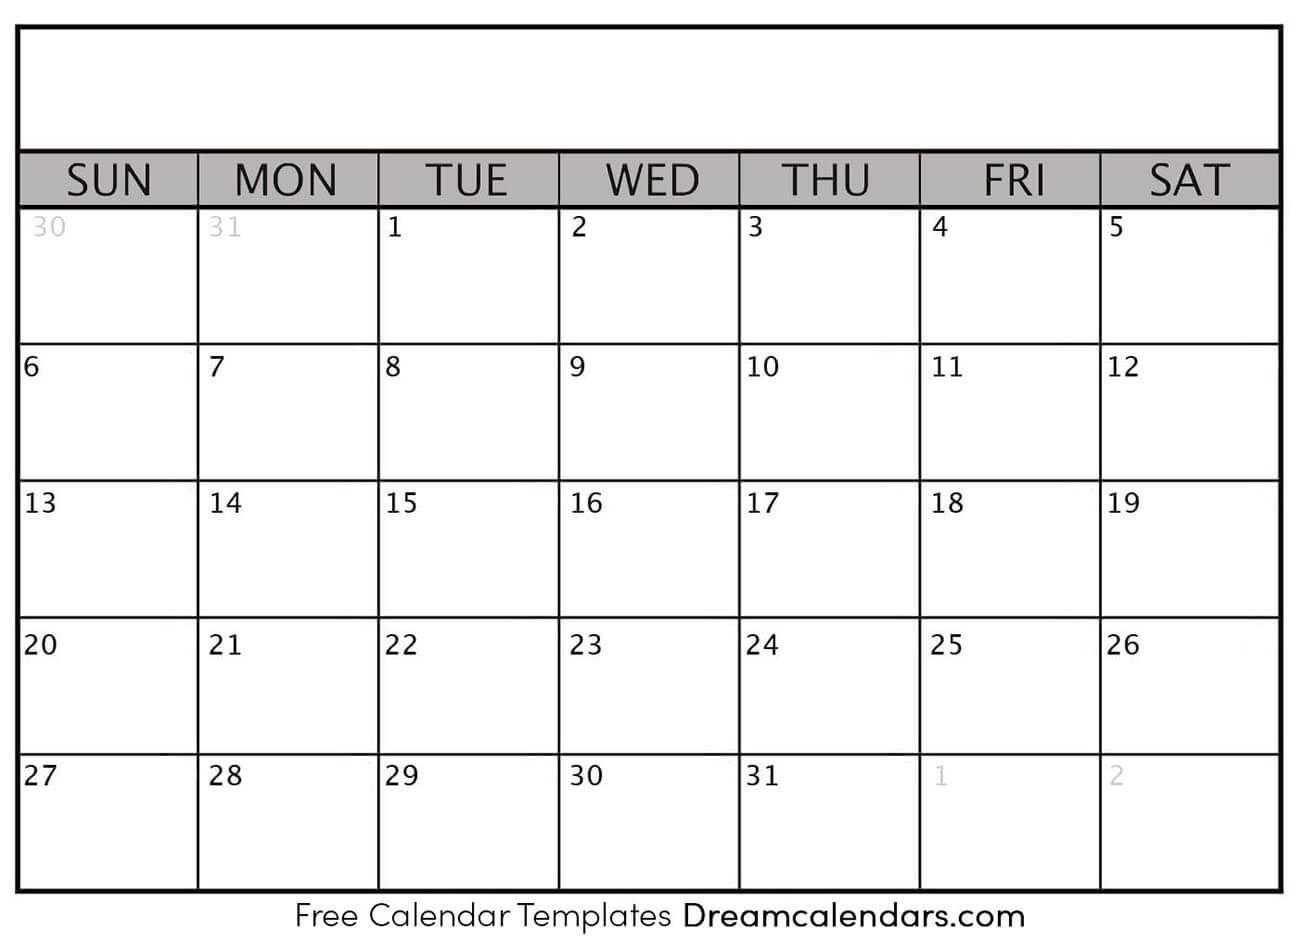 Free Blank Calendar Templates | Blank Calendar Template